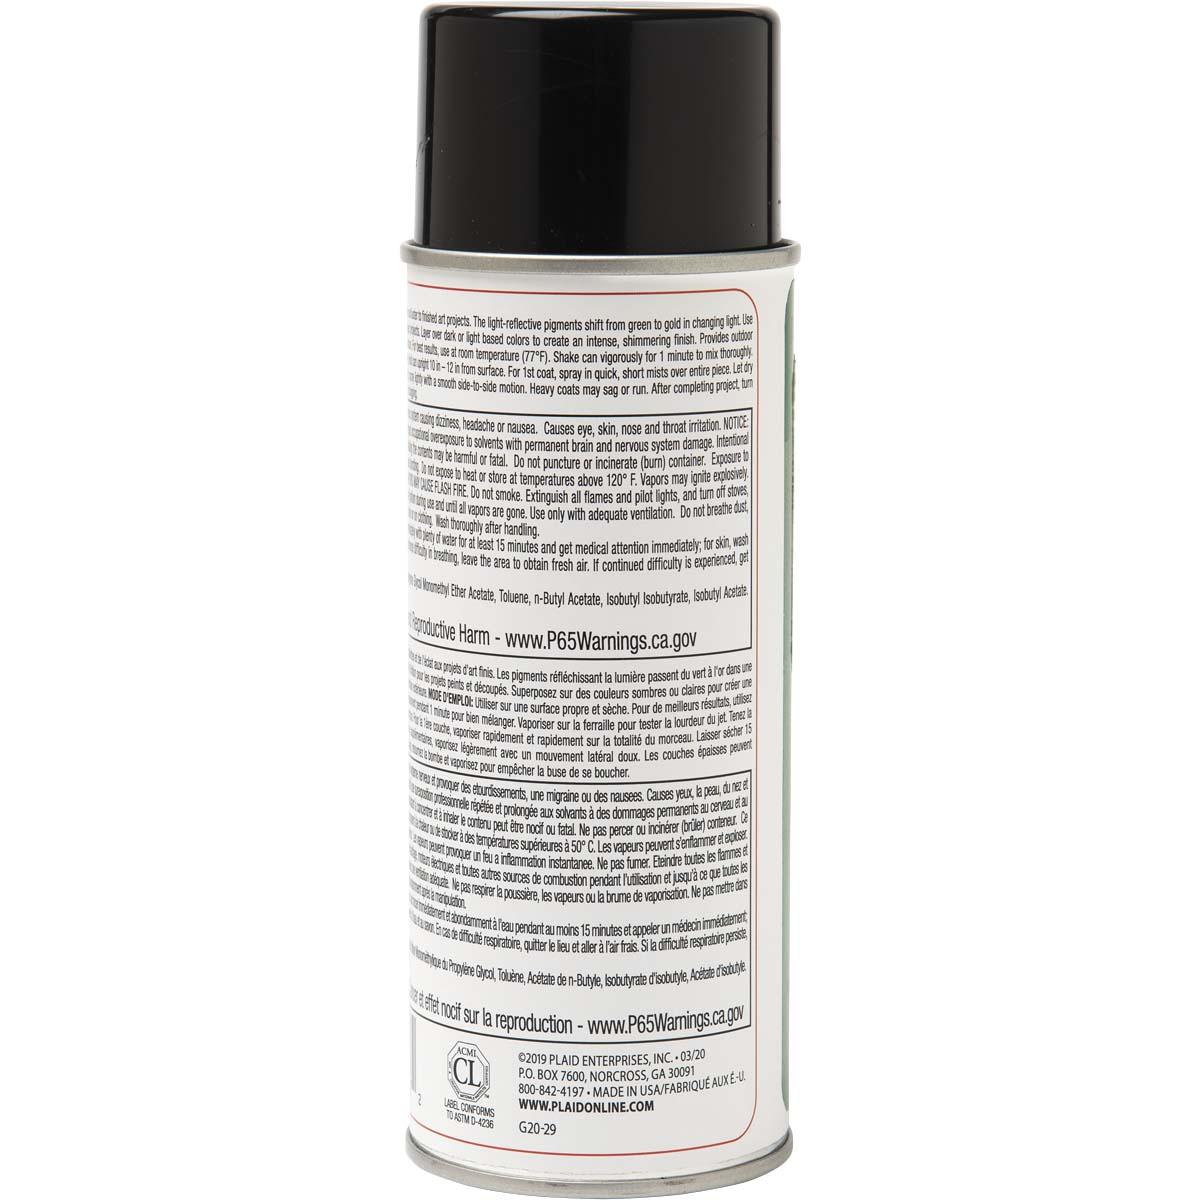 Mod Podge ® Iridescent Acrylic Sealer - Green to Gold Shift, 8 oz. - 1547